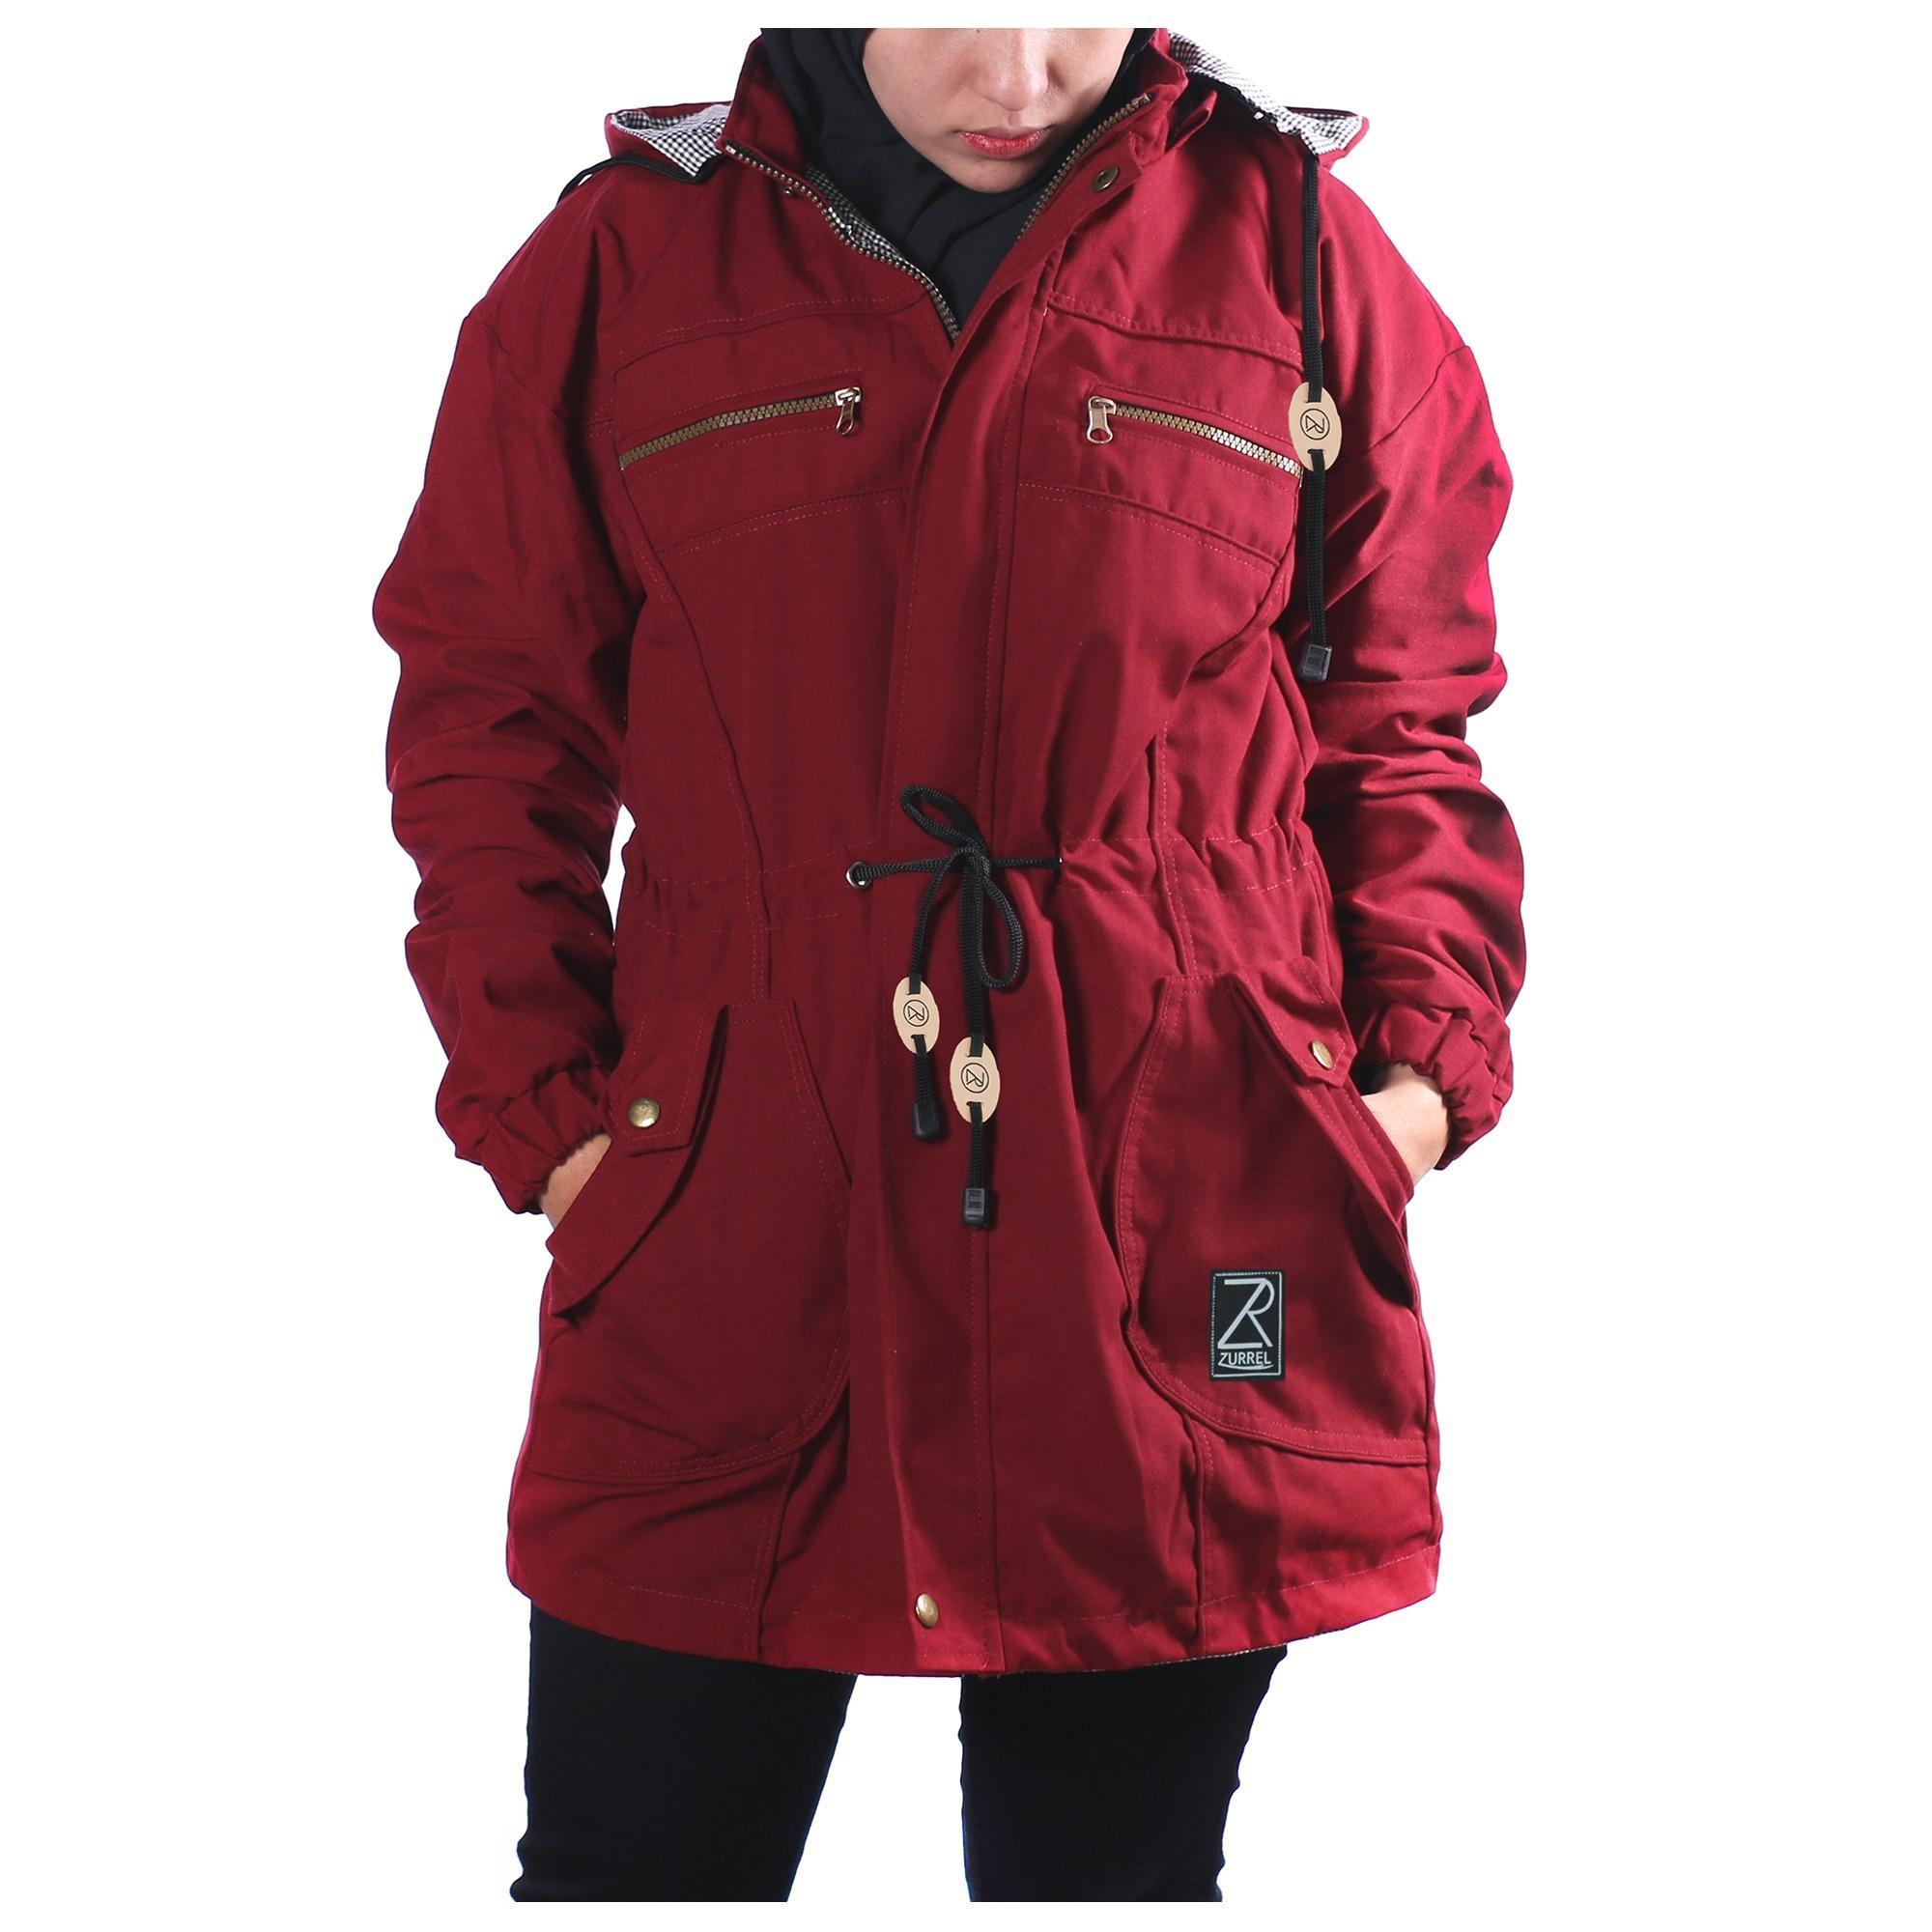 Harga Jaket Parka Mantel Wanita Zurrel Canvas Premium Marun Yang Bagus